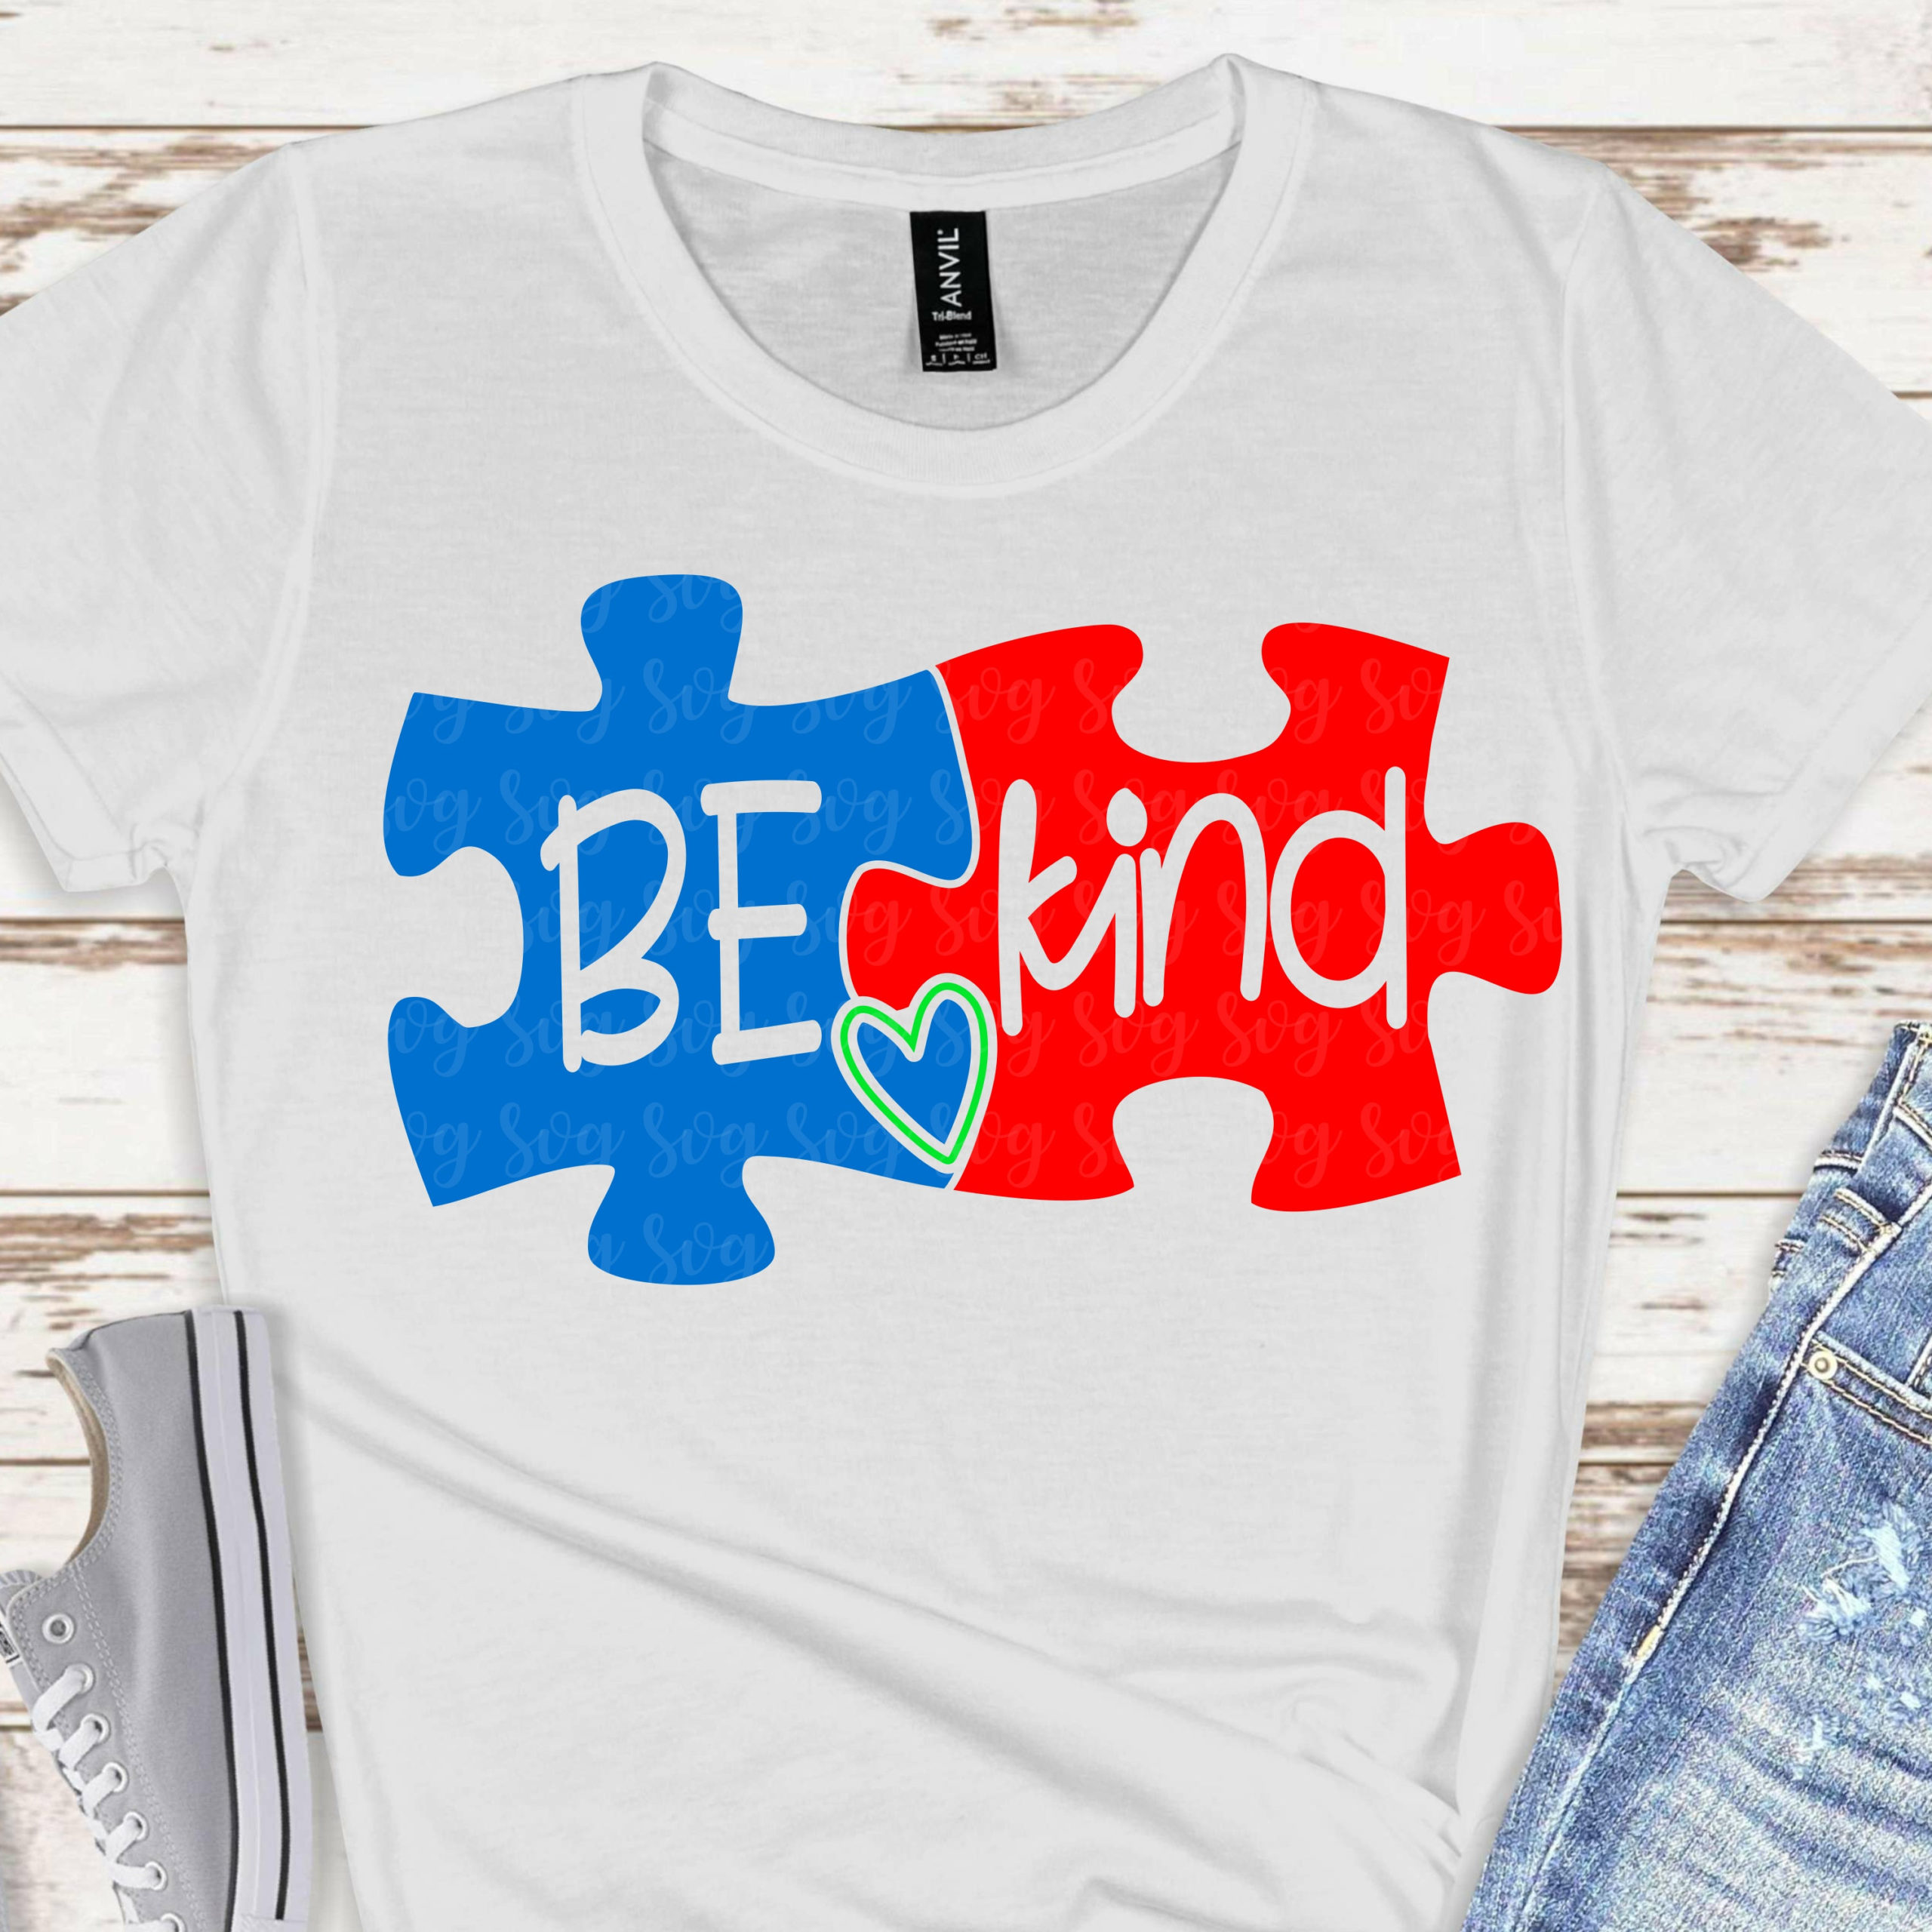 Be-kind-puzzle-svgautism-be-kind-be-kind-autism-autism-svg-autism-puzzle-svgcricut-designssilhouette-designs-be-kind-be-kind-svg-5ef7929f